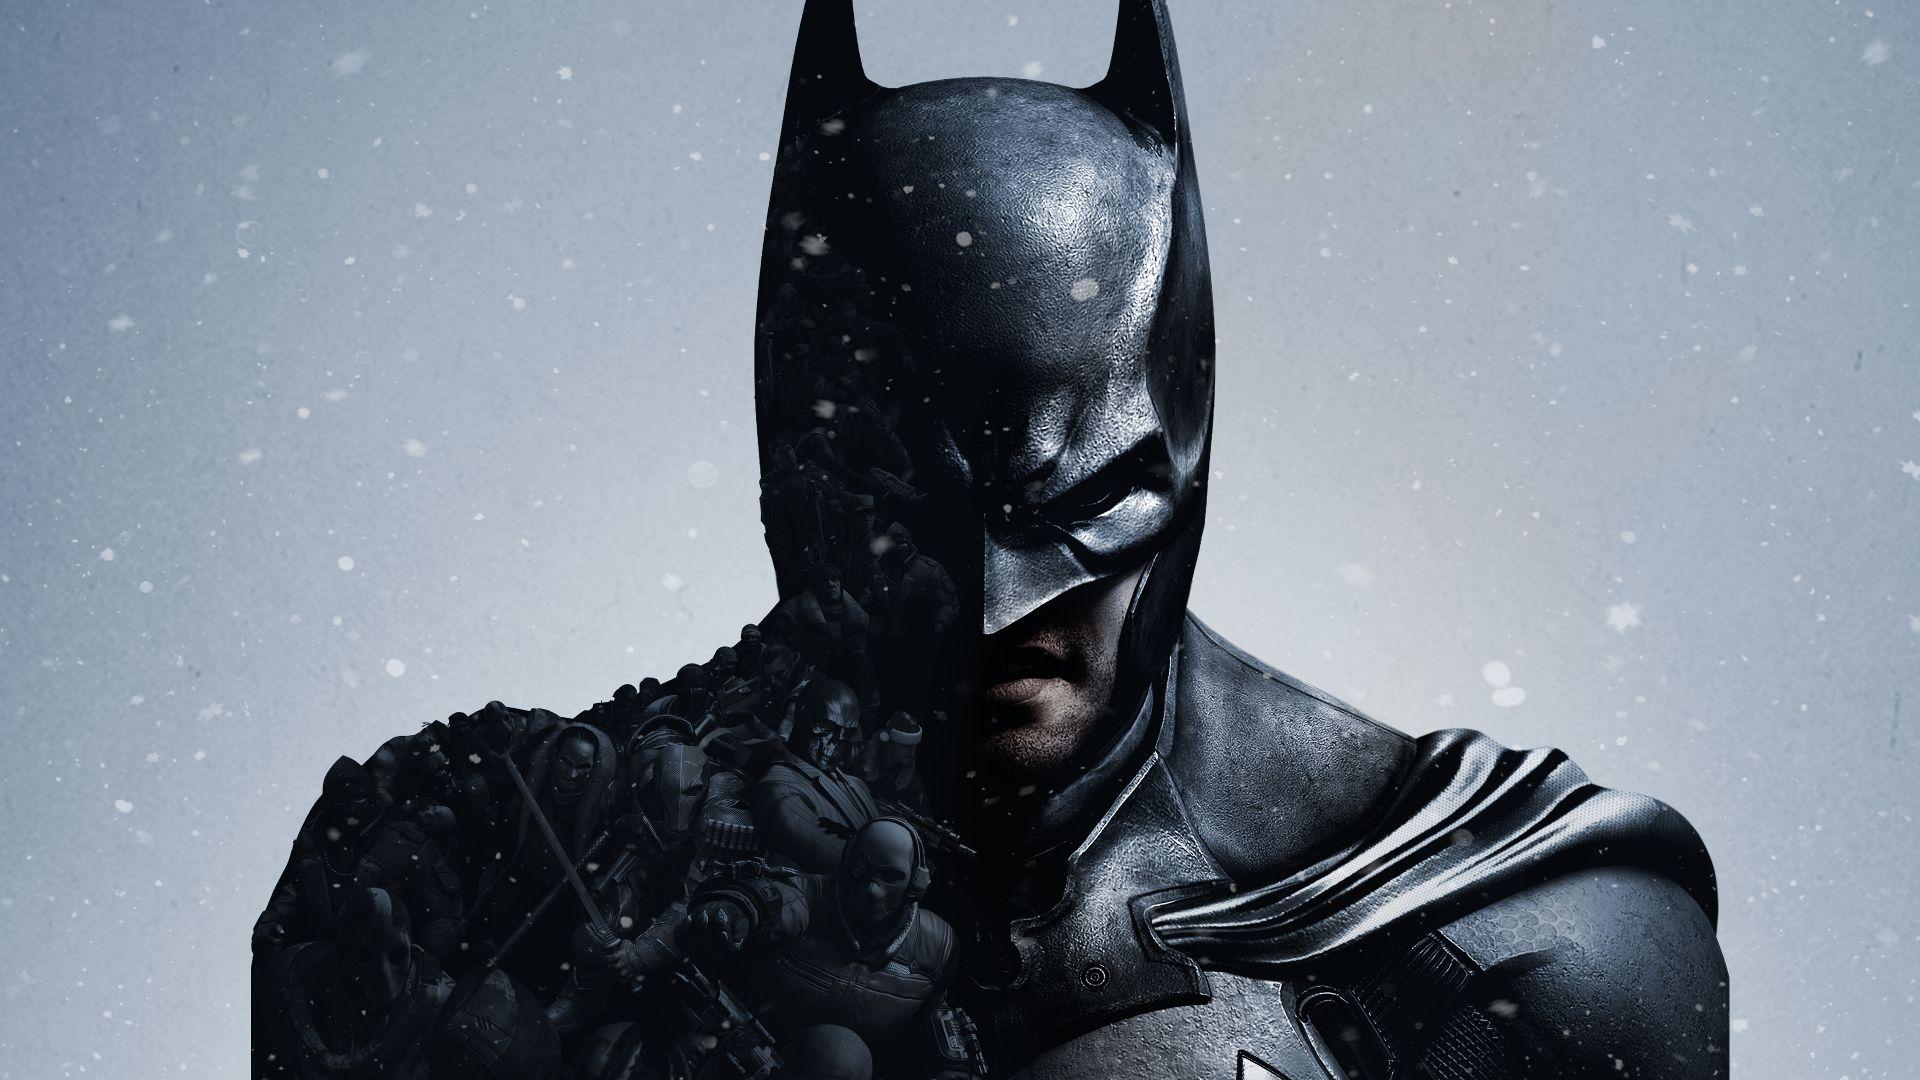 Batman: Arkham Origins Screenshot 7